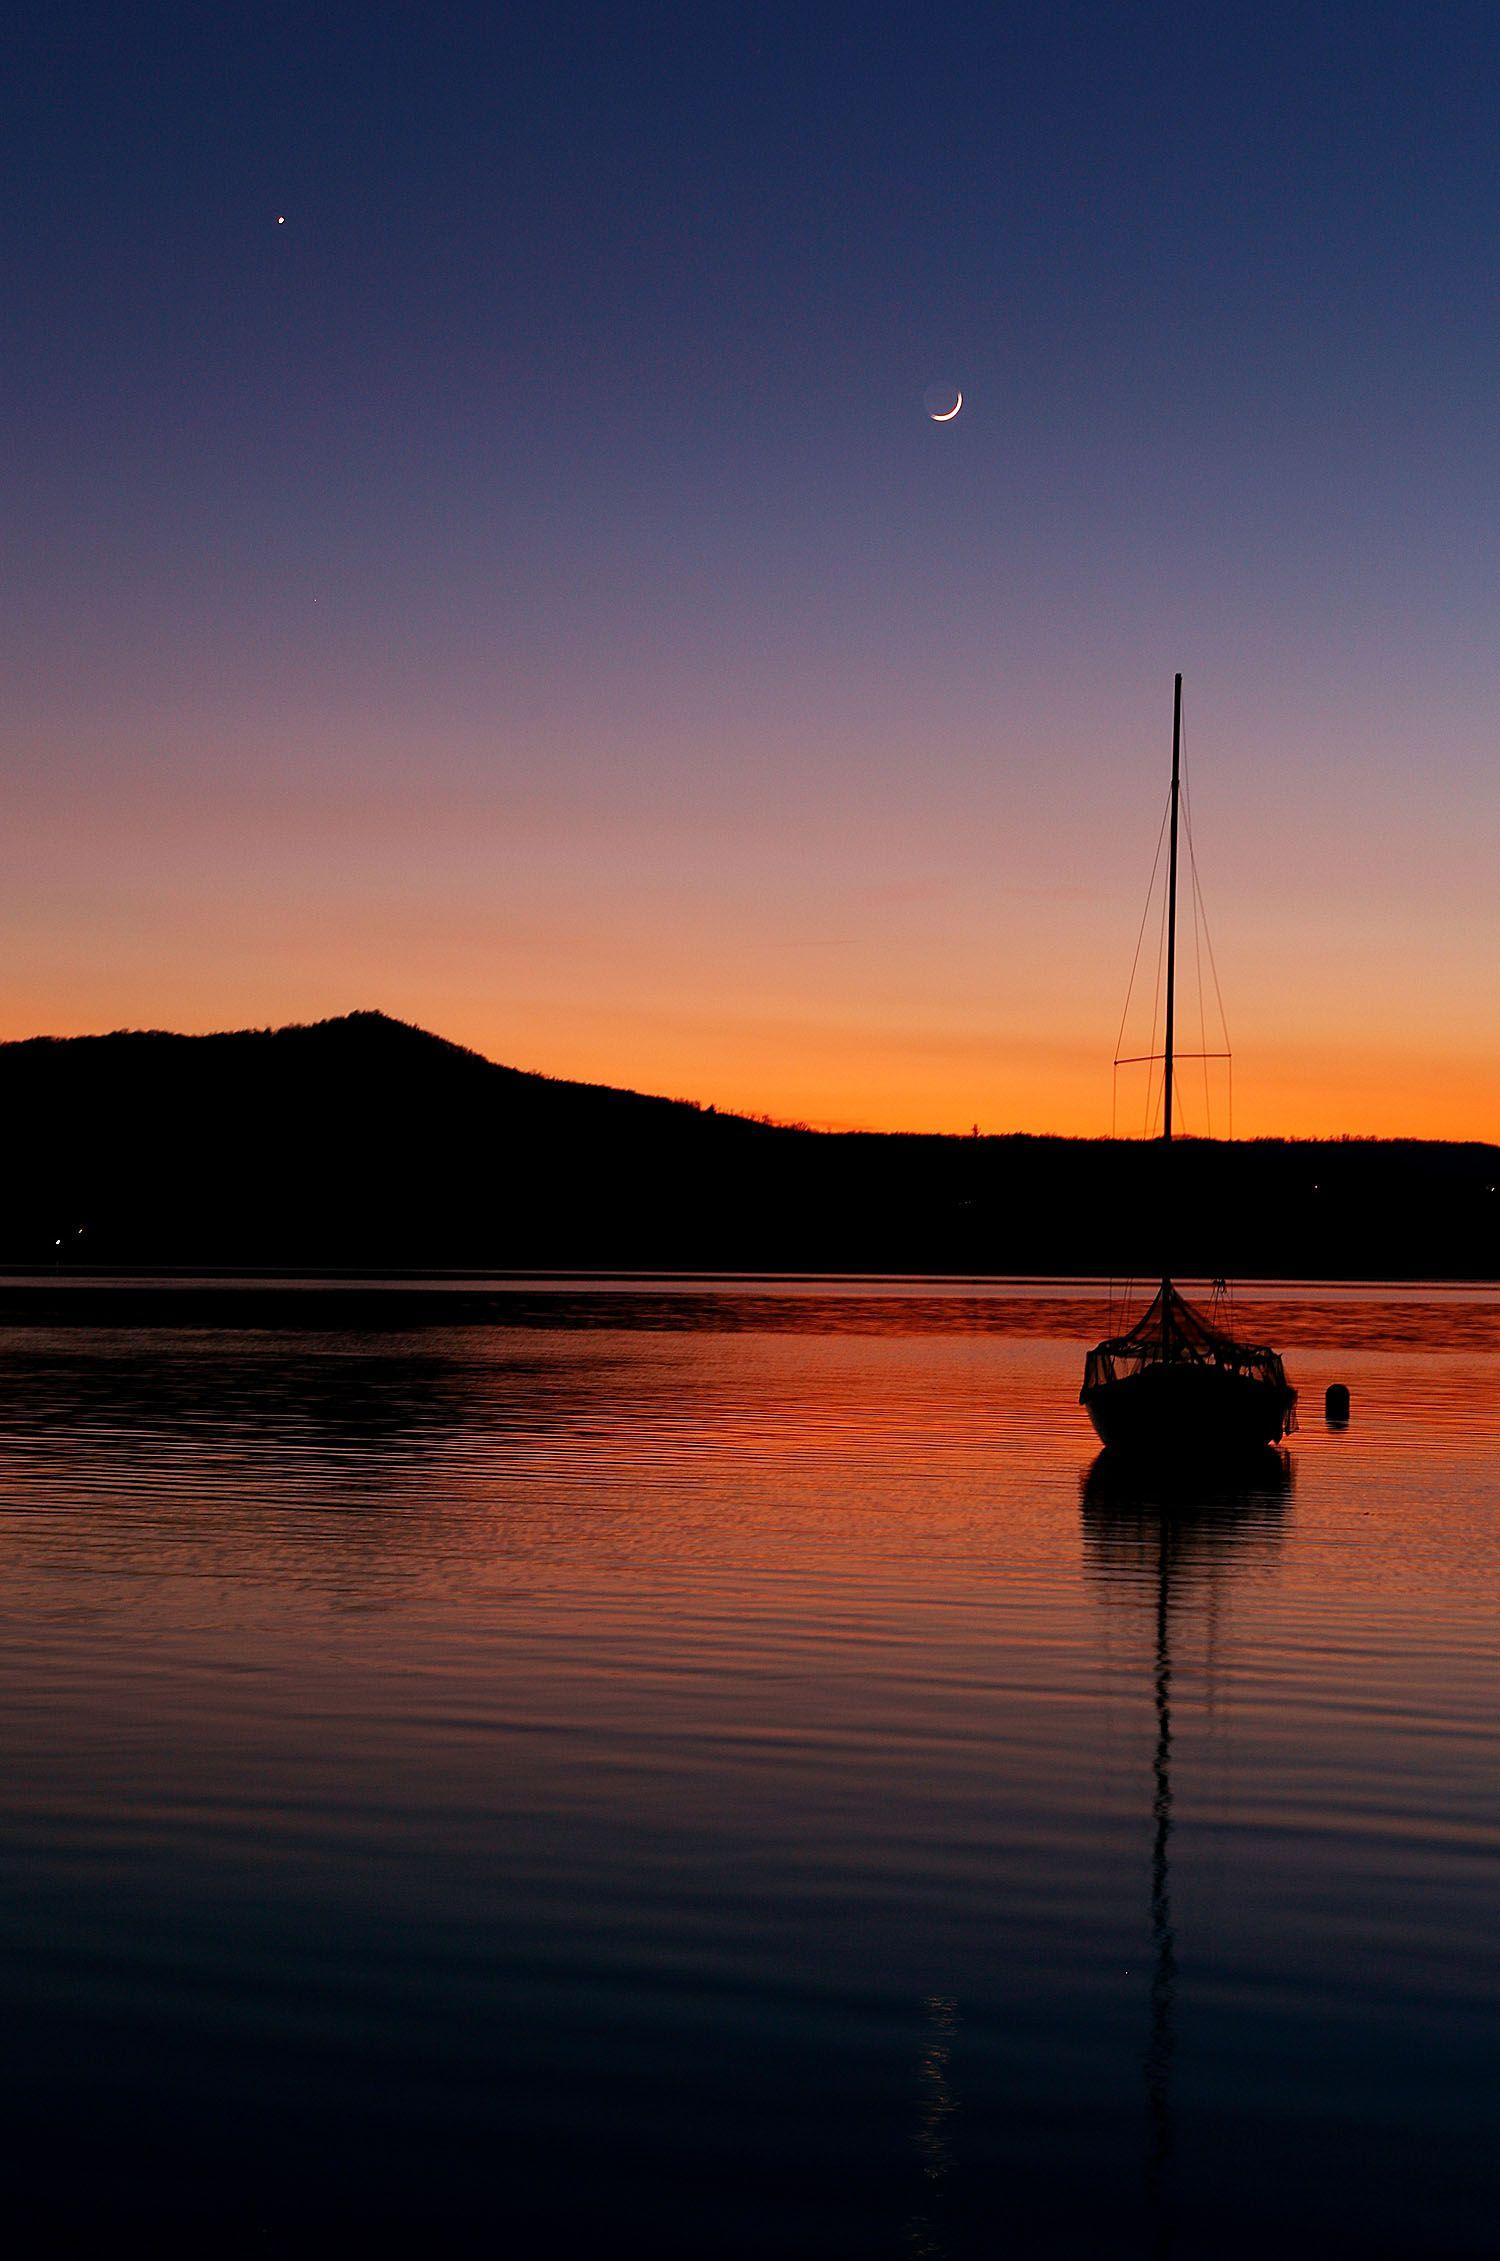 Serene Sunset Images Sunset Beautiful Sunset Moon boat sunset sail evening lake